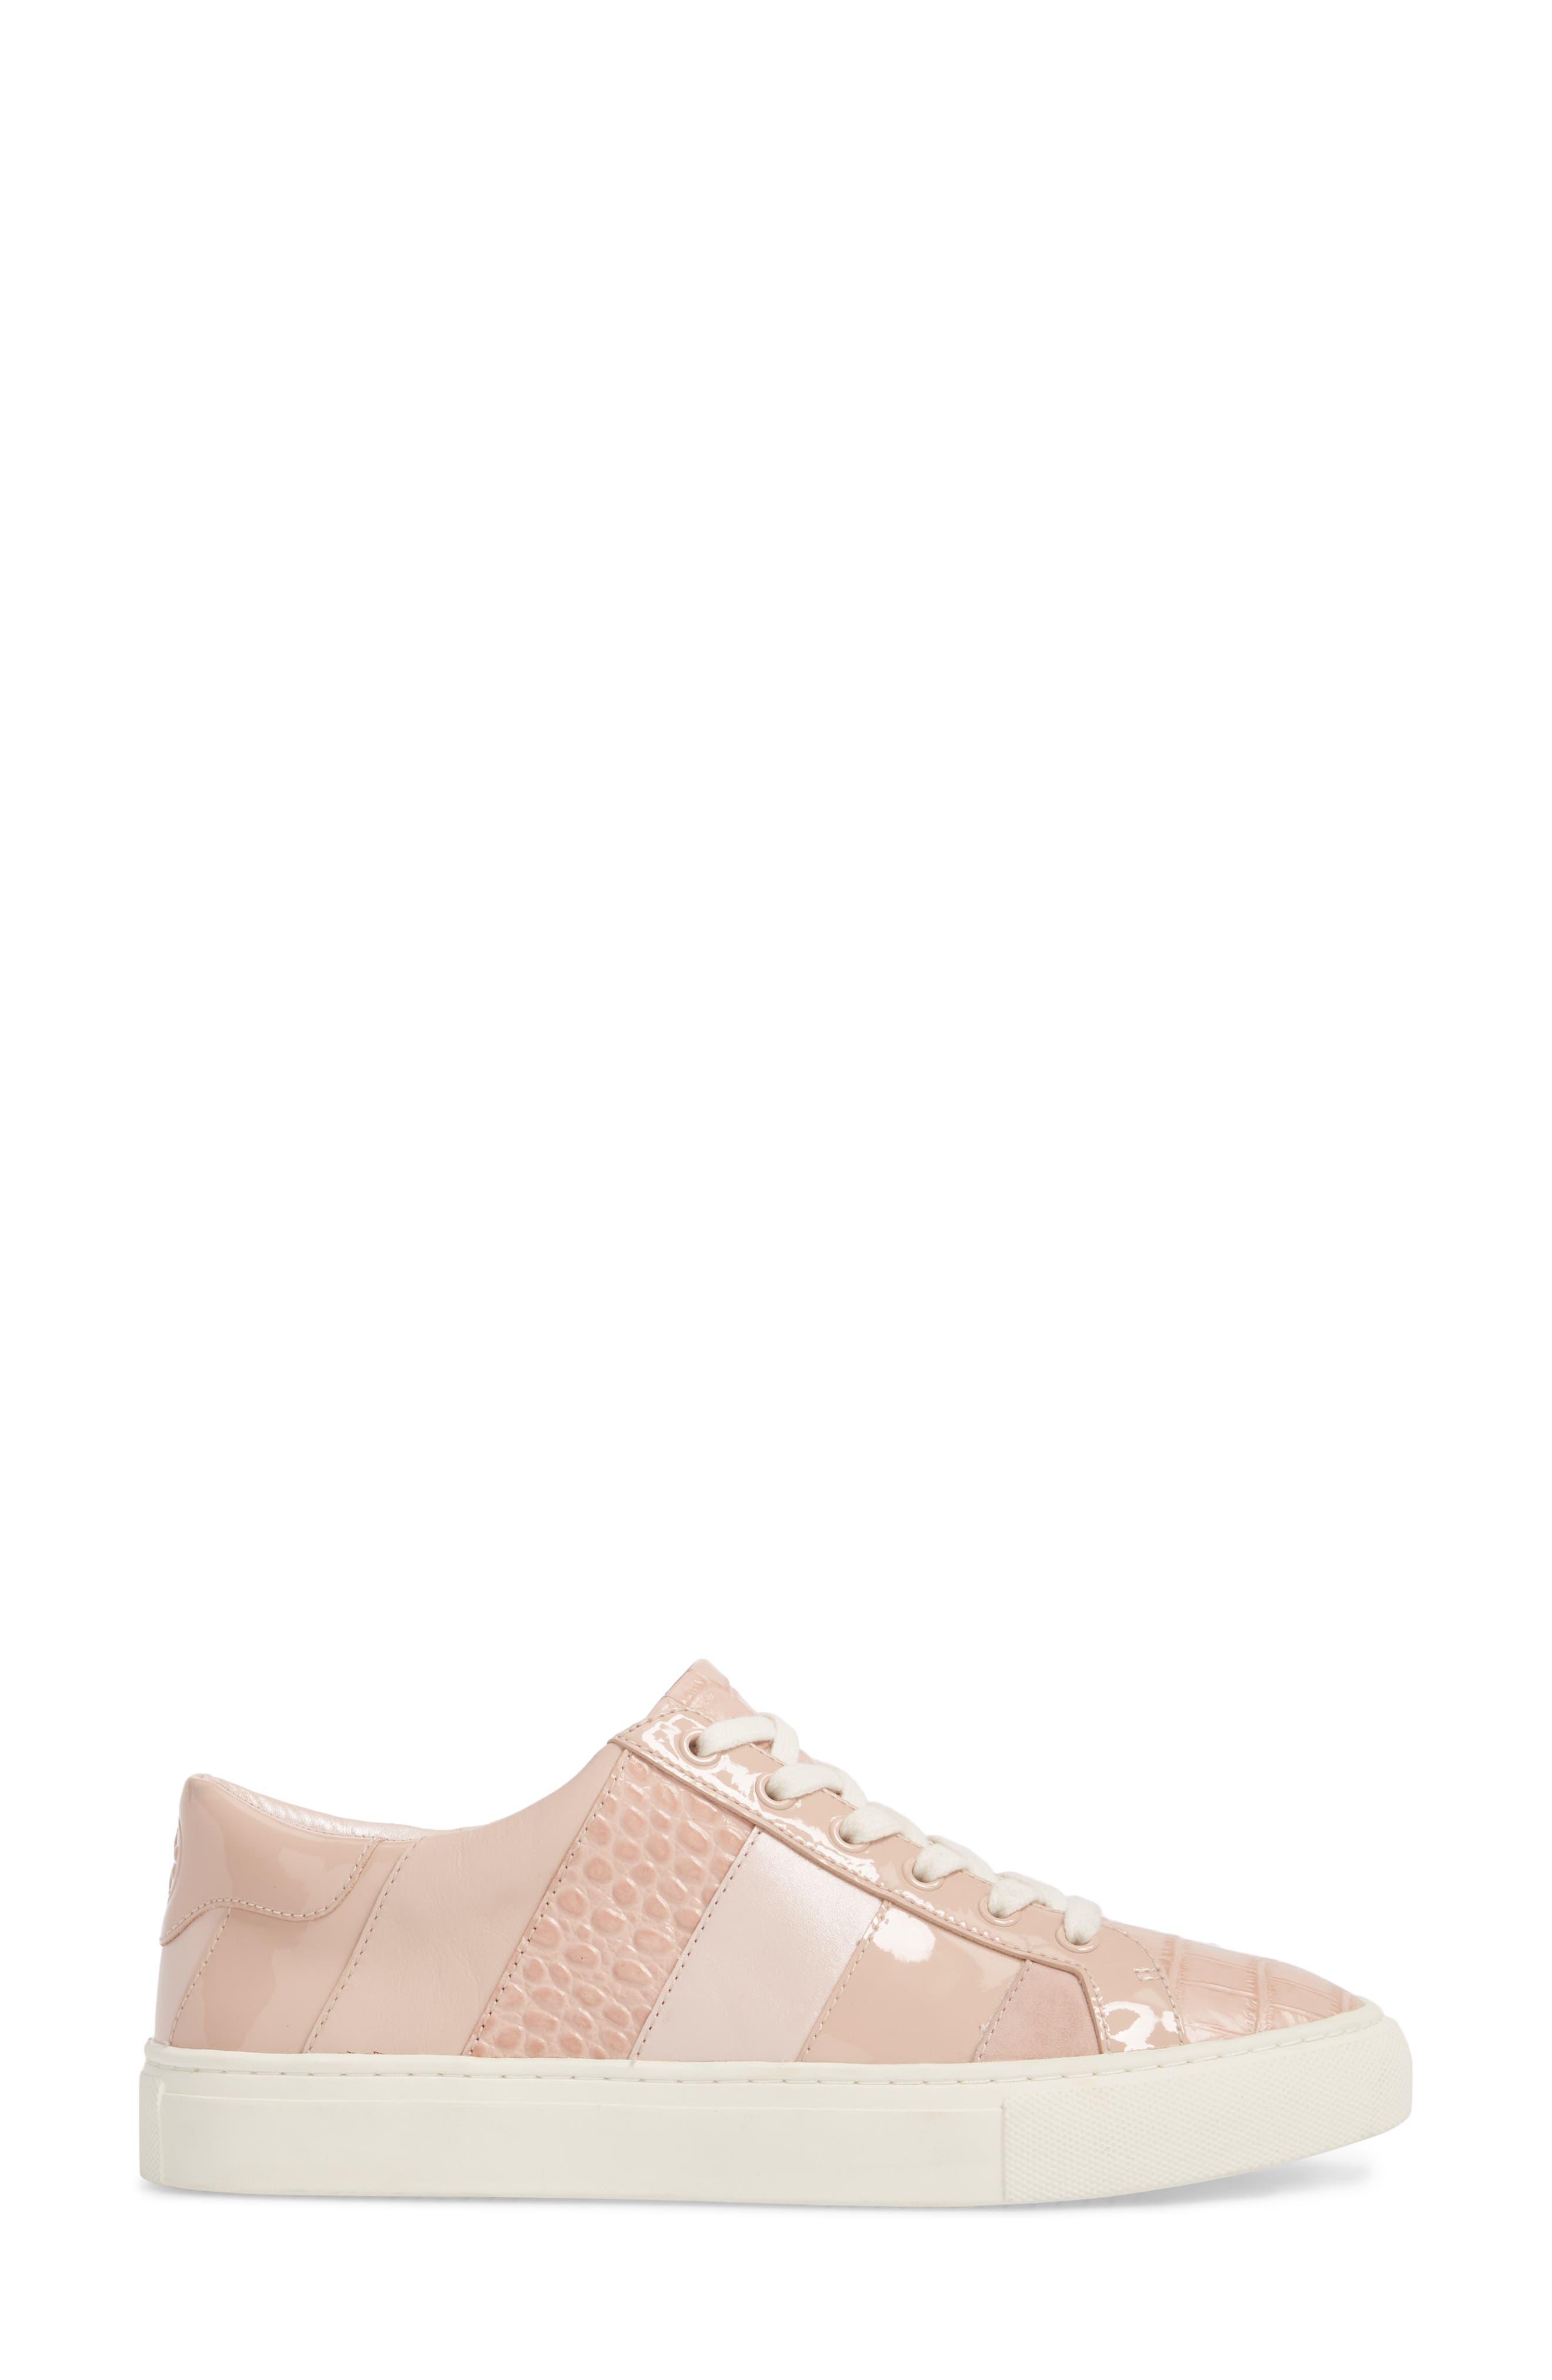 Ames Sneaker,                             Alternate thumbnail 3, color,                             Sea Shell Pink/ Sea Shell Pink